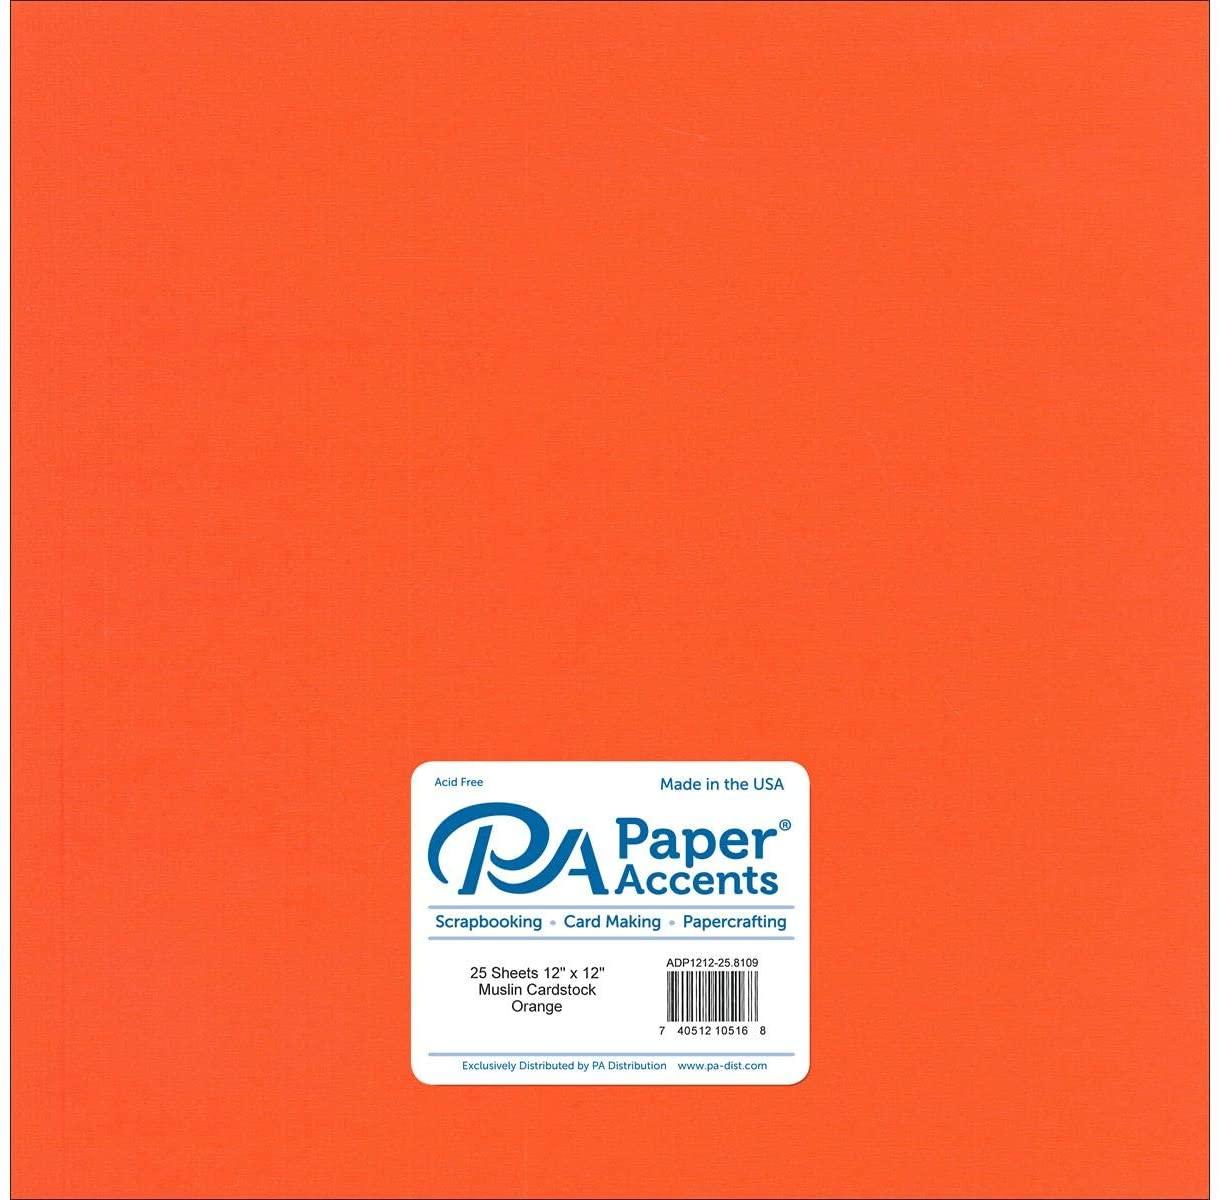 Cardstock 12 x 12 in. Muslin Orange (25 sheets)